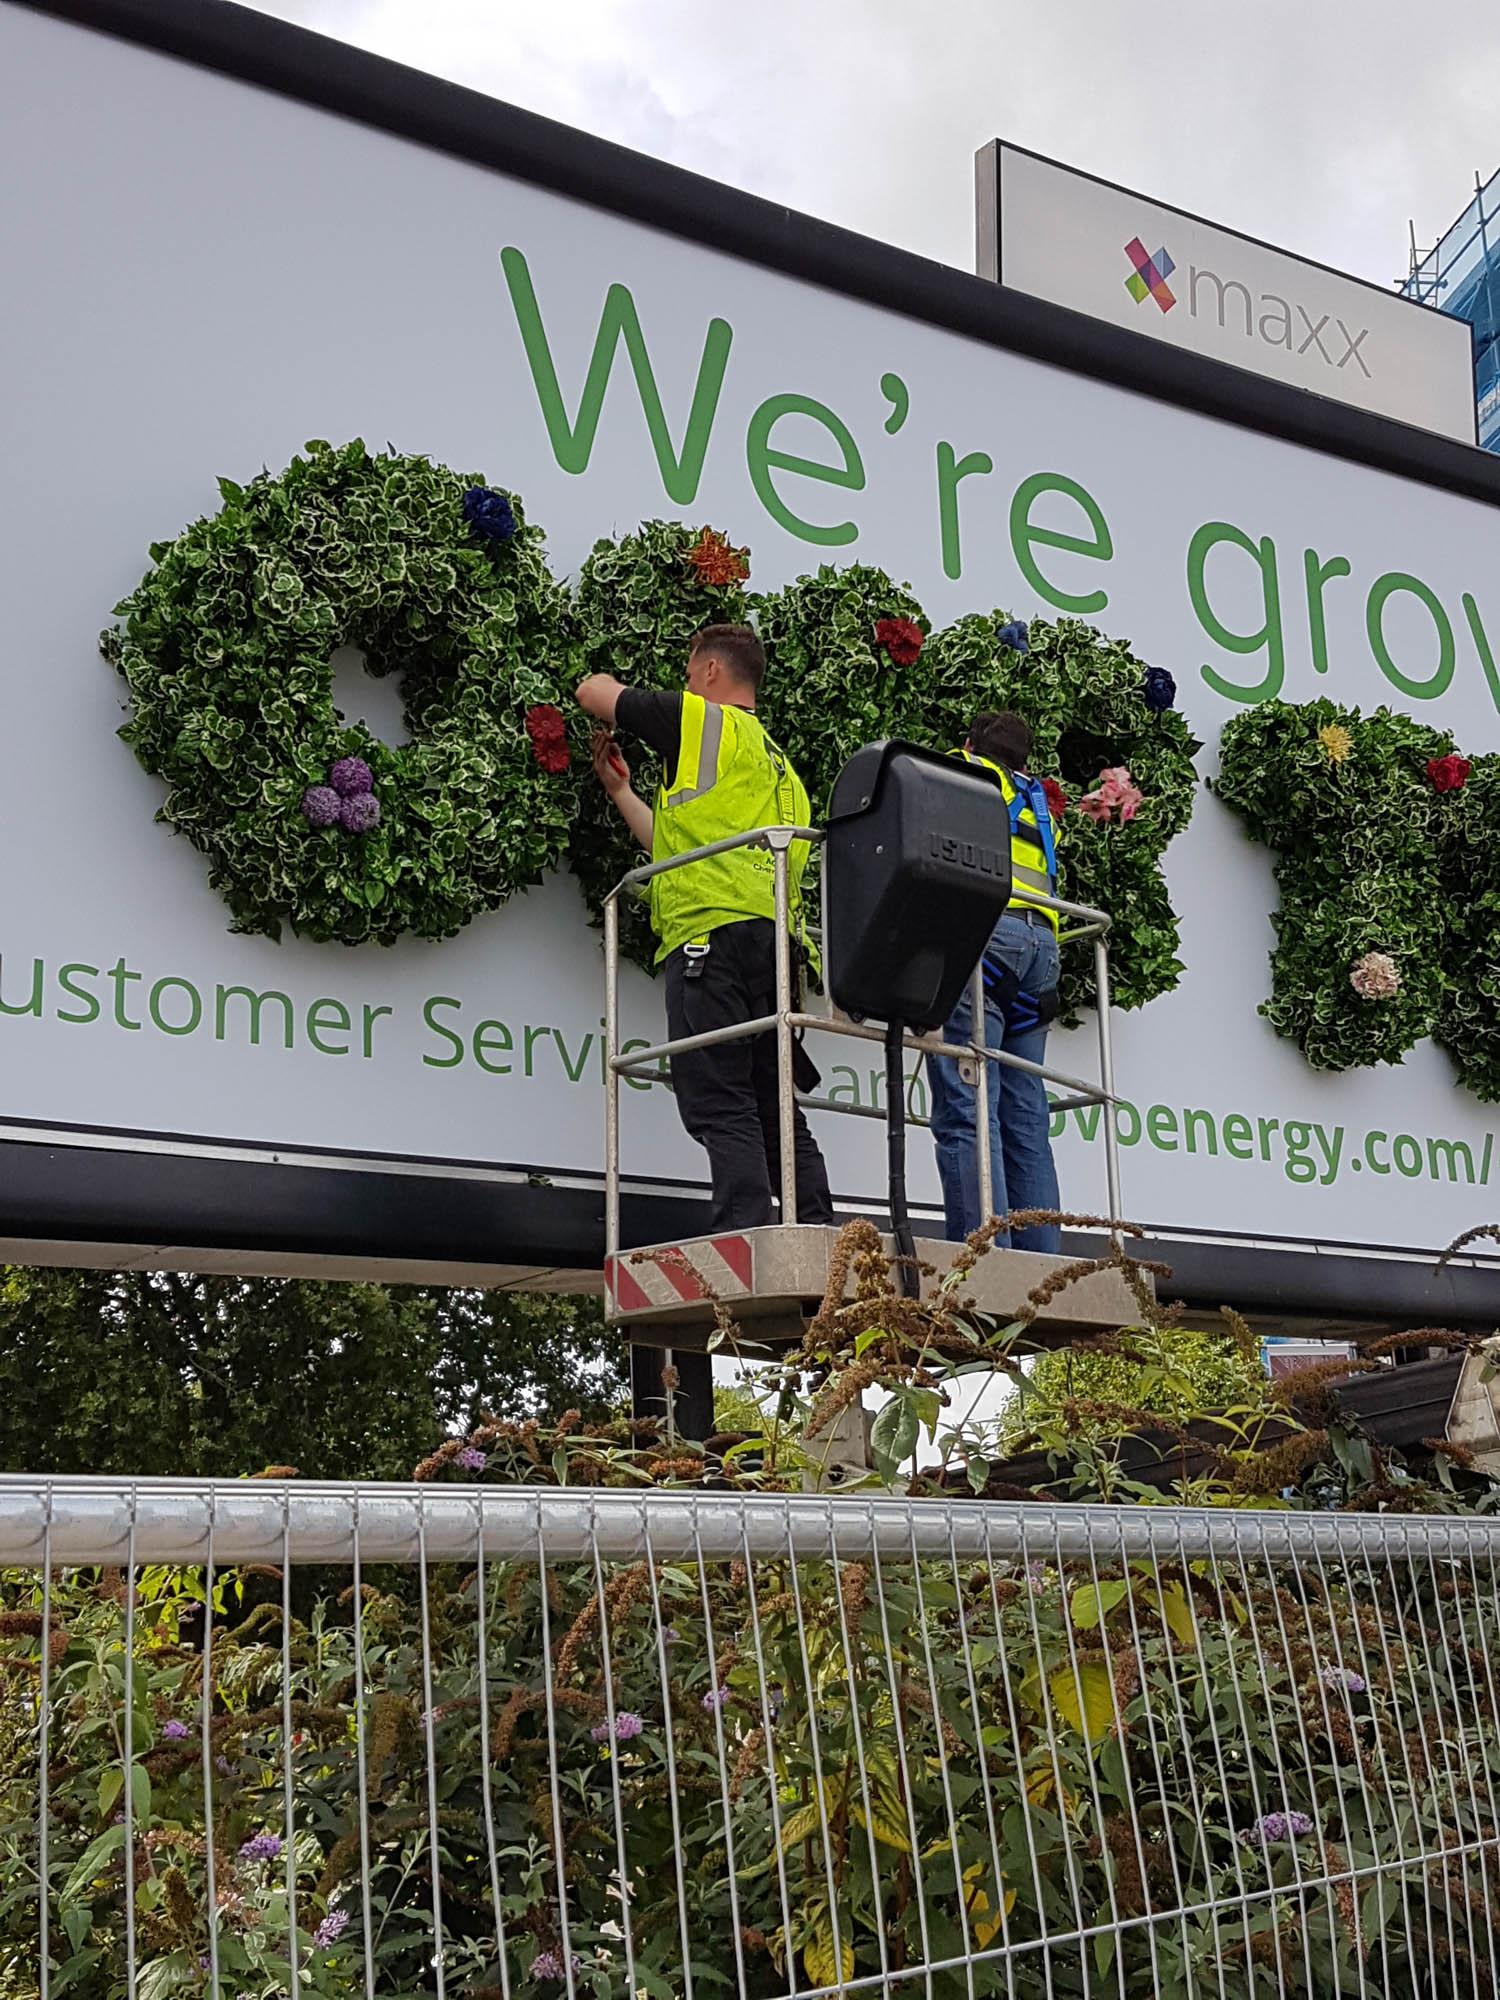 thirty-three-exterior-plant-display-billboard-mosswall-bespoke-custom-bristol-plantcare-ovo-energy-image-13